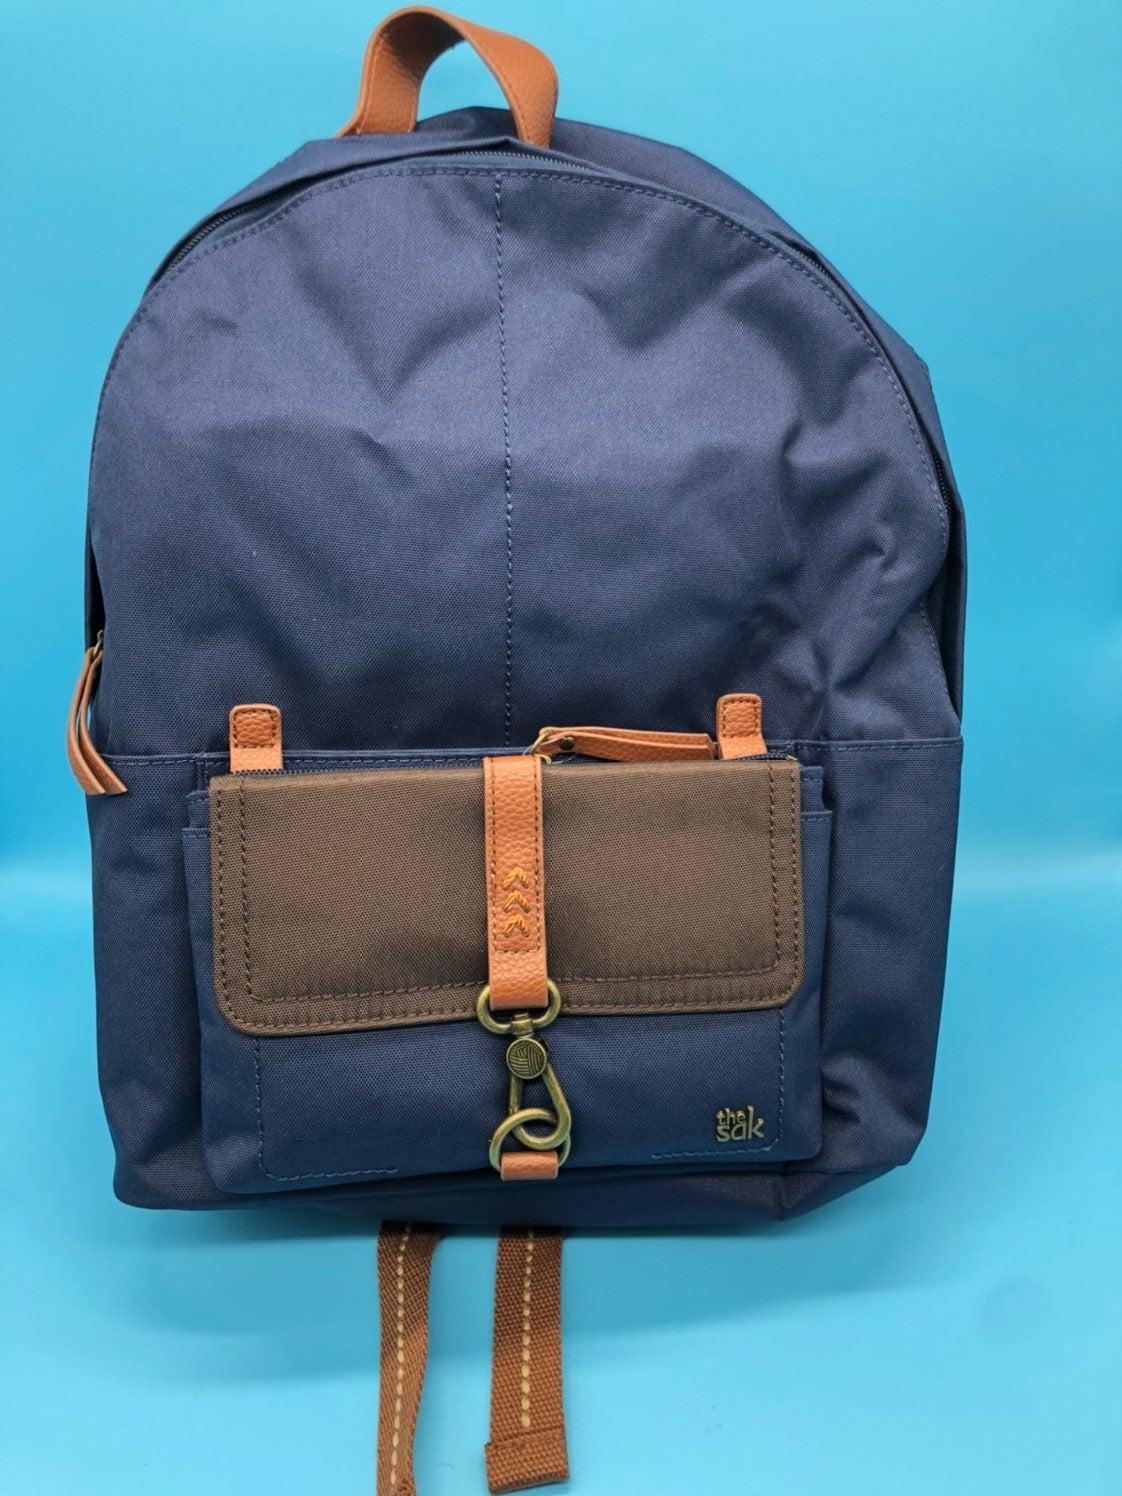 The Sak Global Trotter Navy Blue Backpac